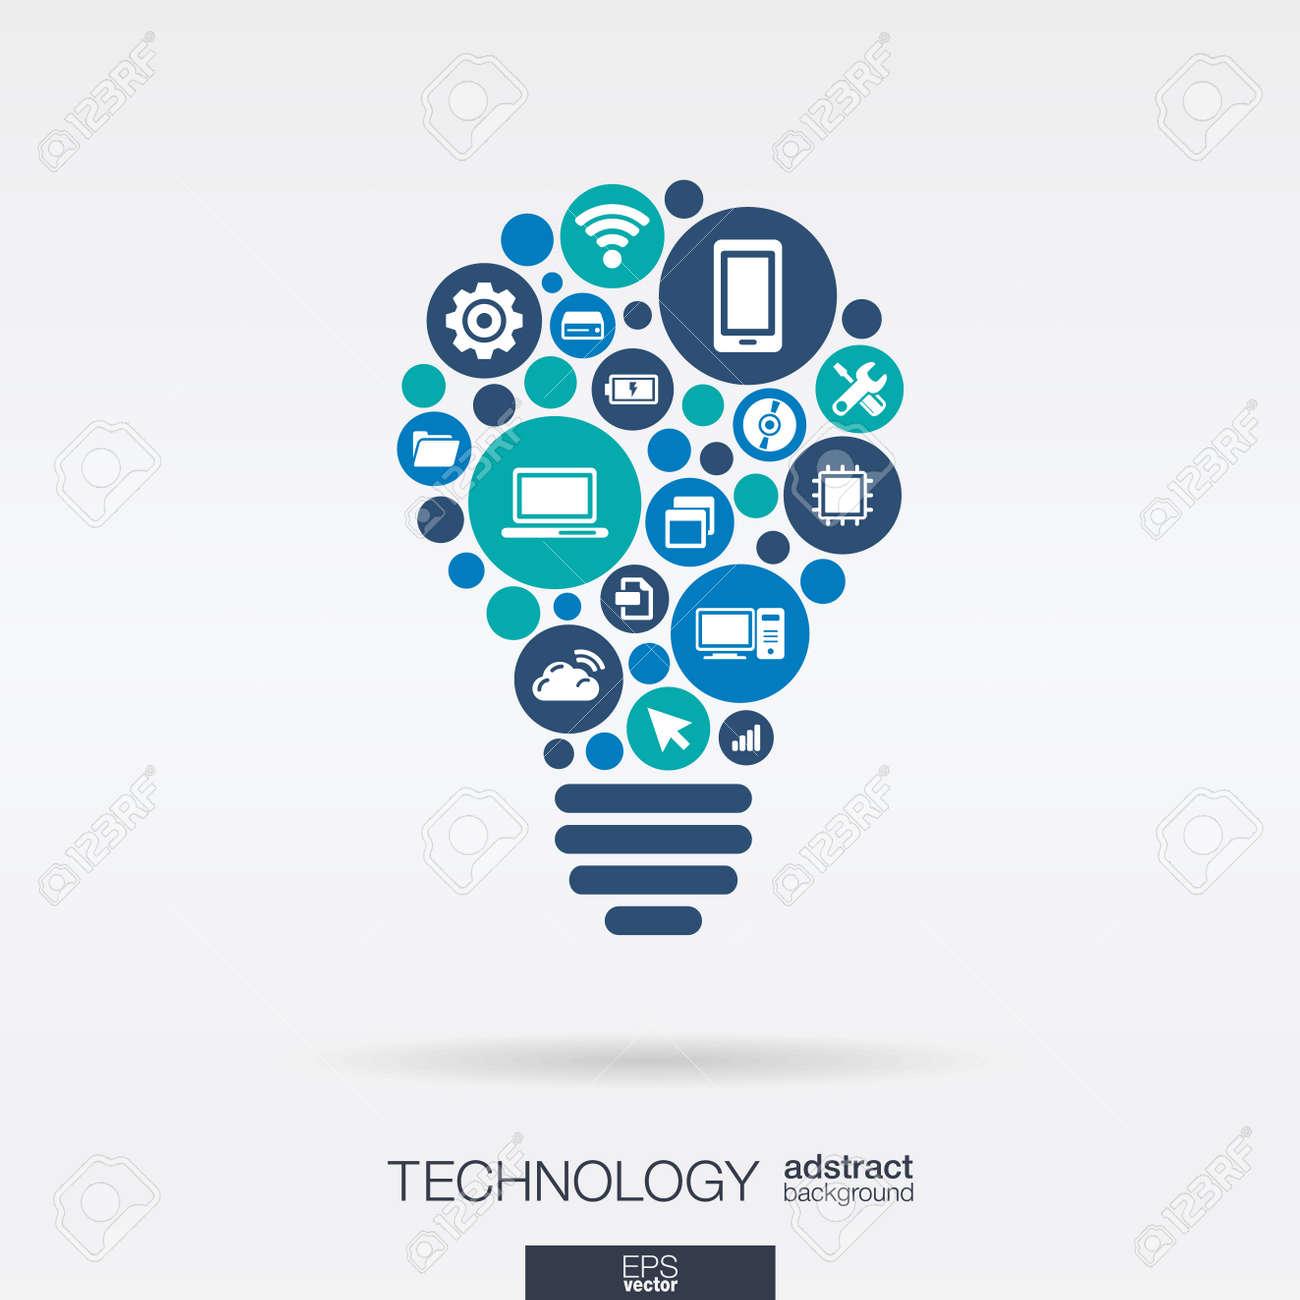 Color circles, flat icons in idea bulb shape: technology, cloud computing, digital concept. - 43347917